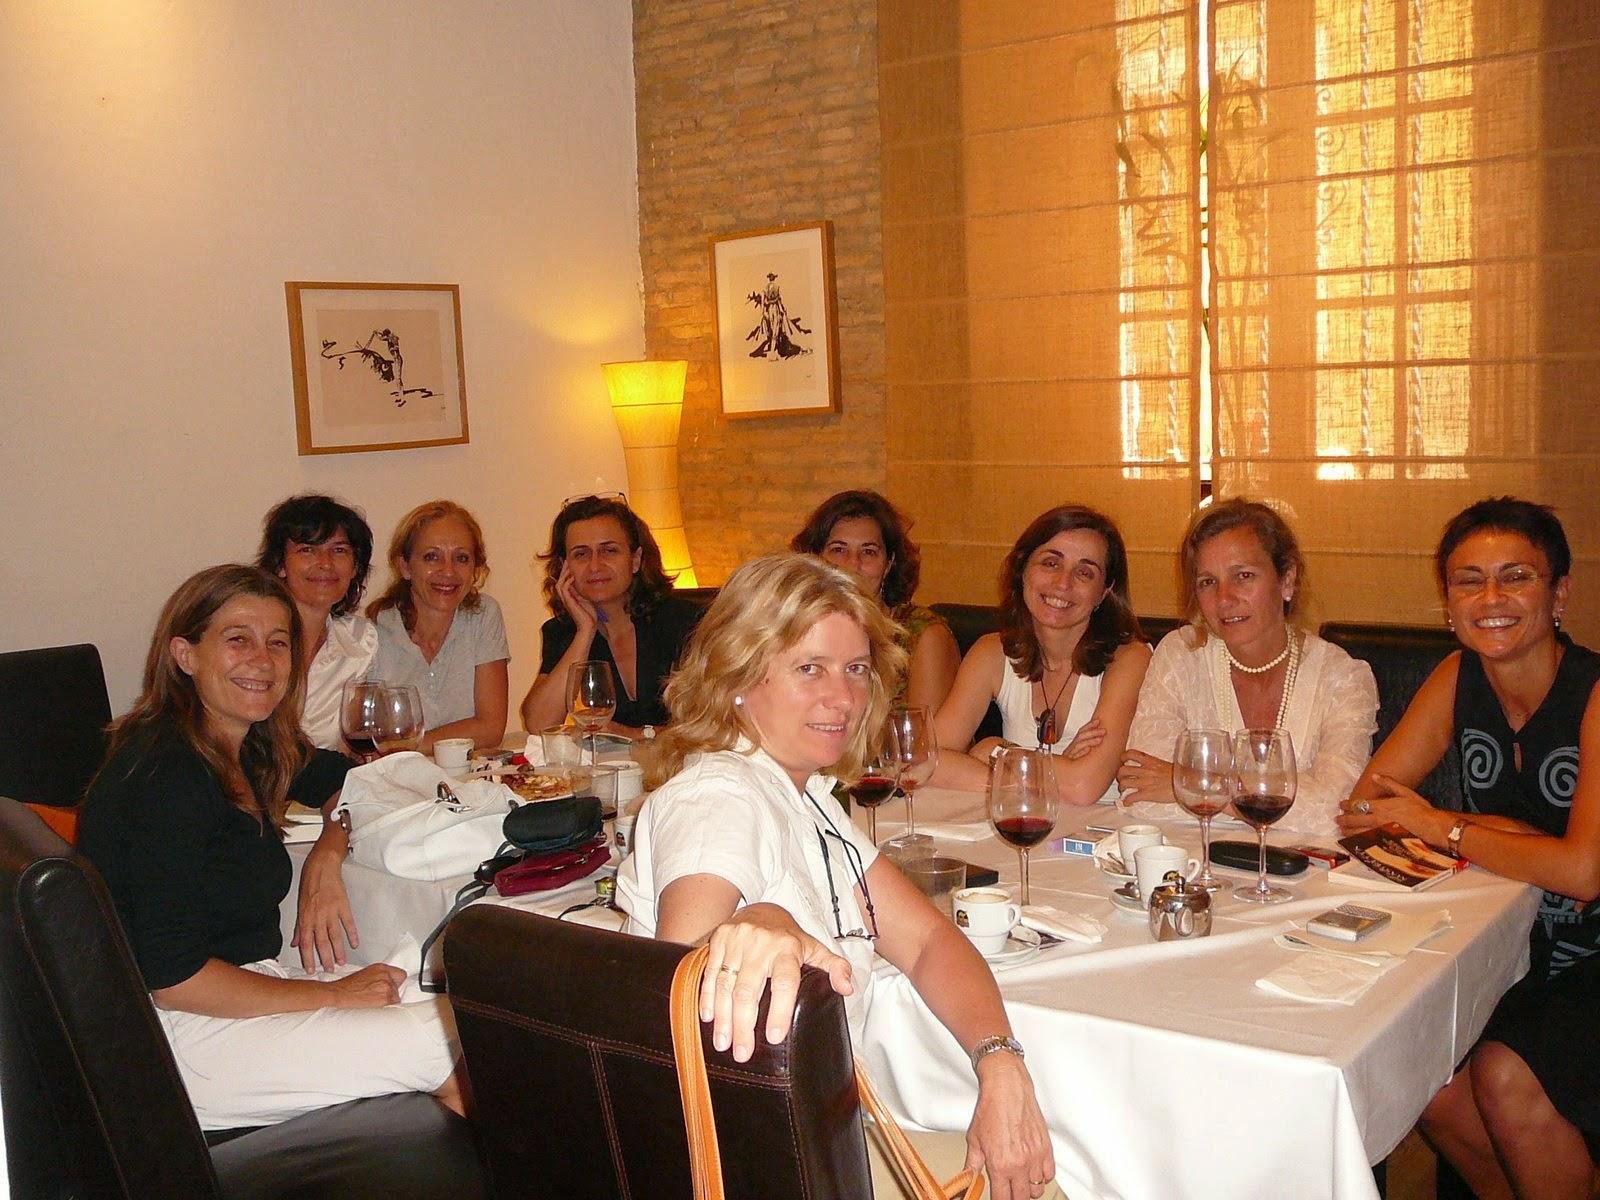 http://hoylibro.blogspot.com.es/2007_06_01_archive.html